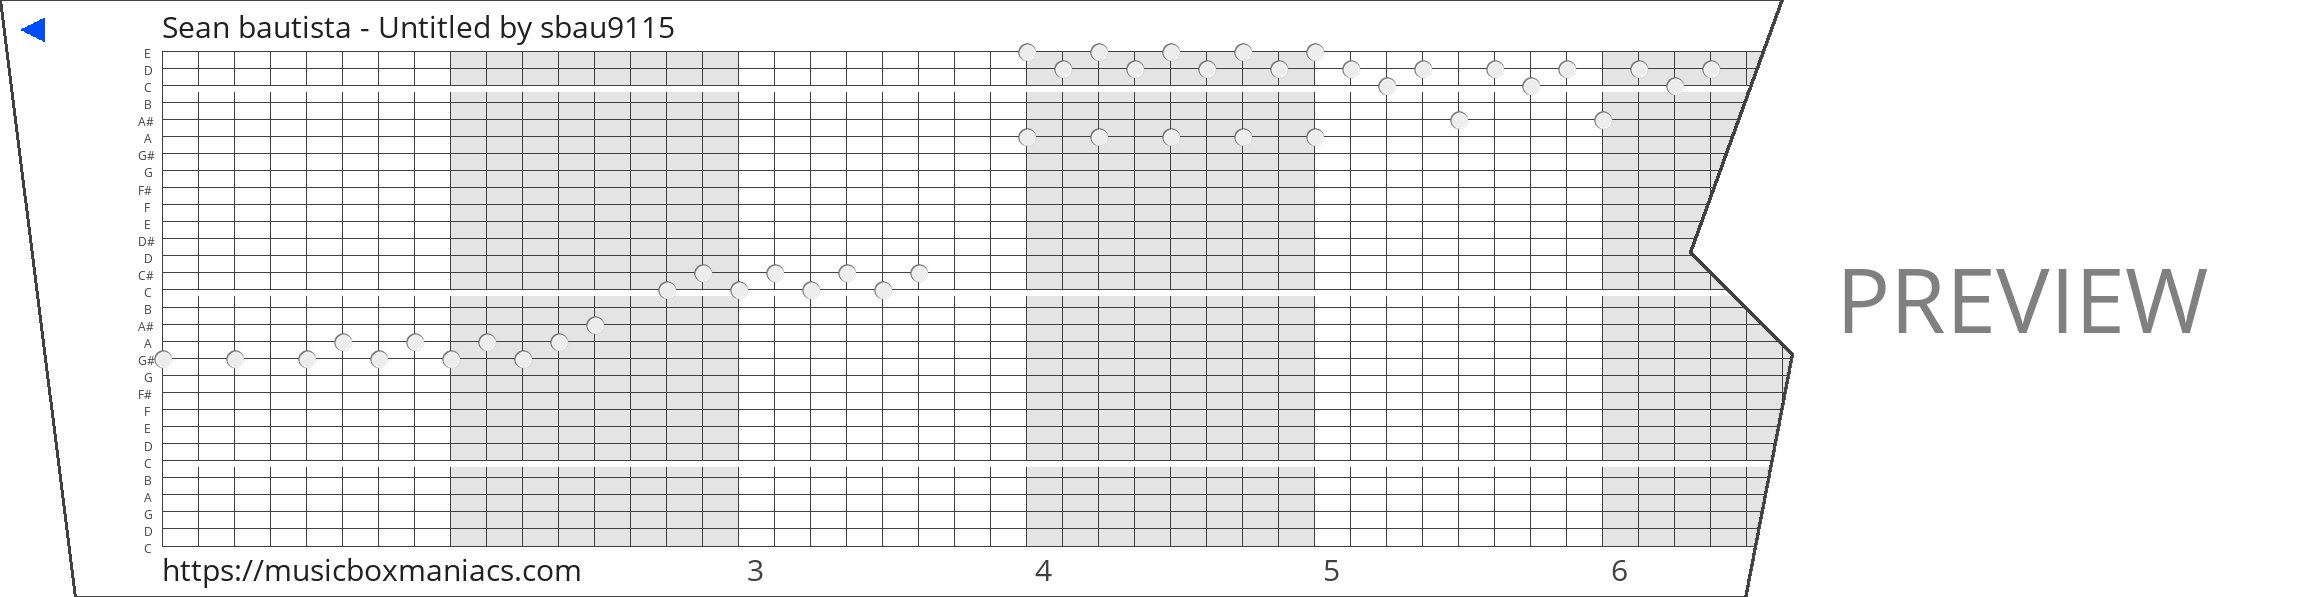 Sean bautista - Untitled 30 note music box paper strip